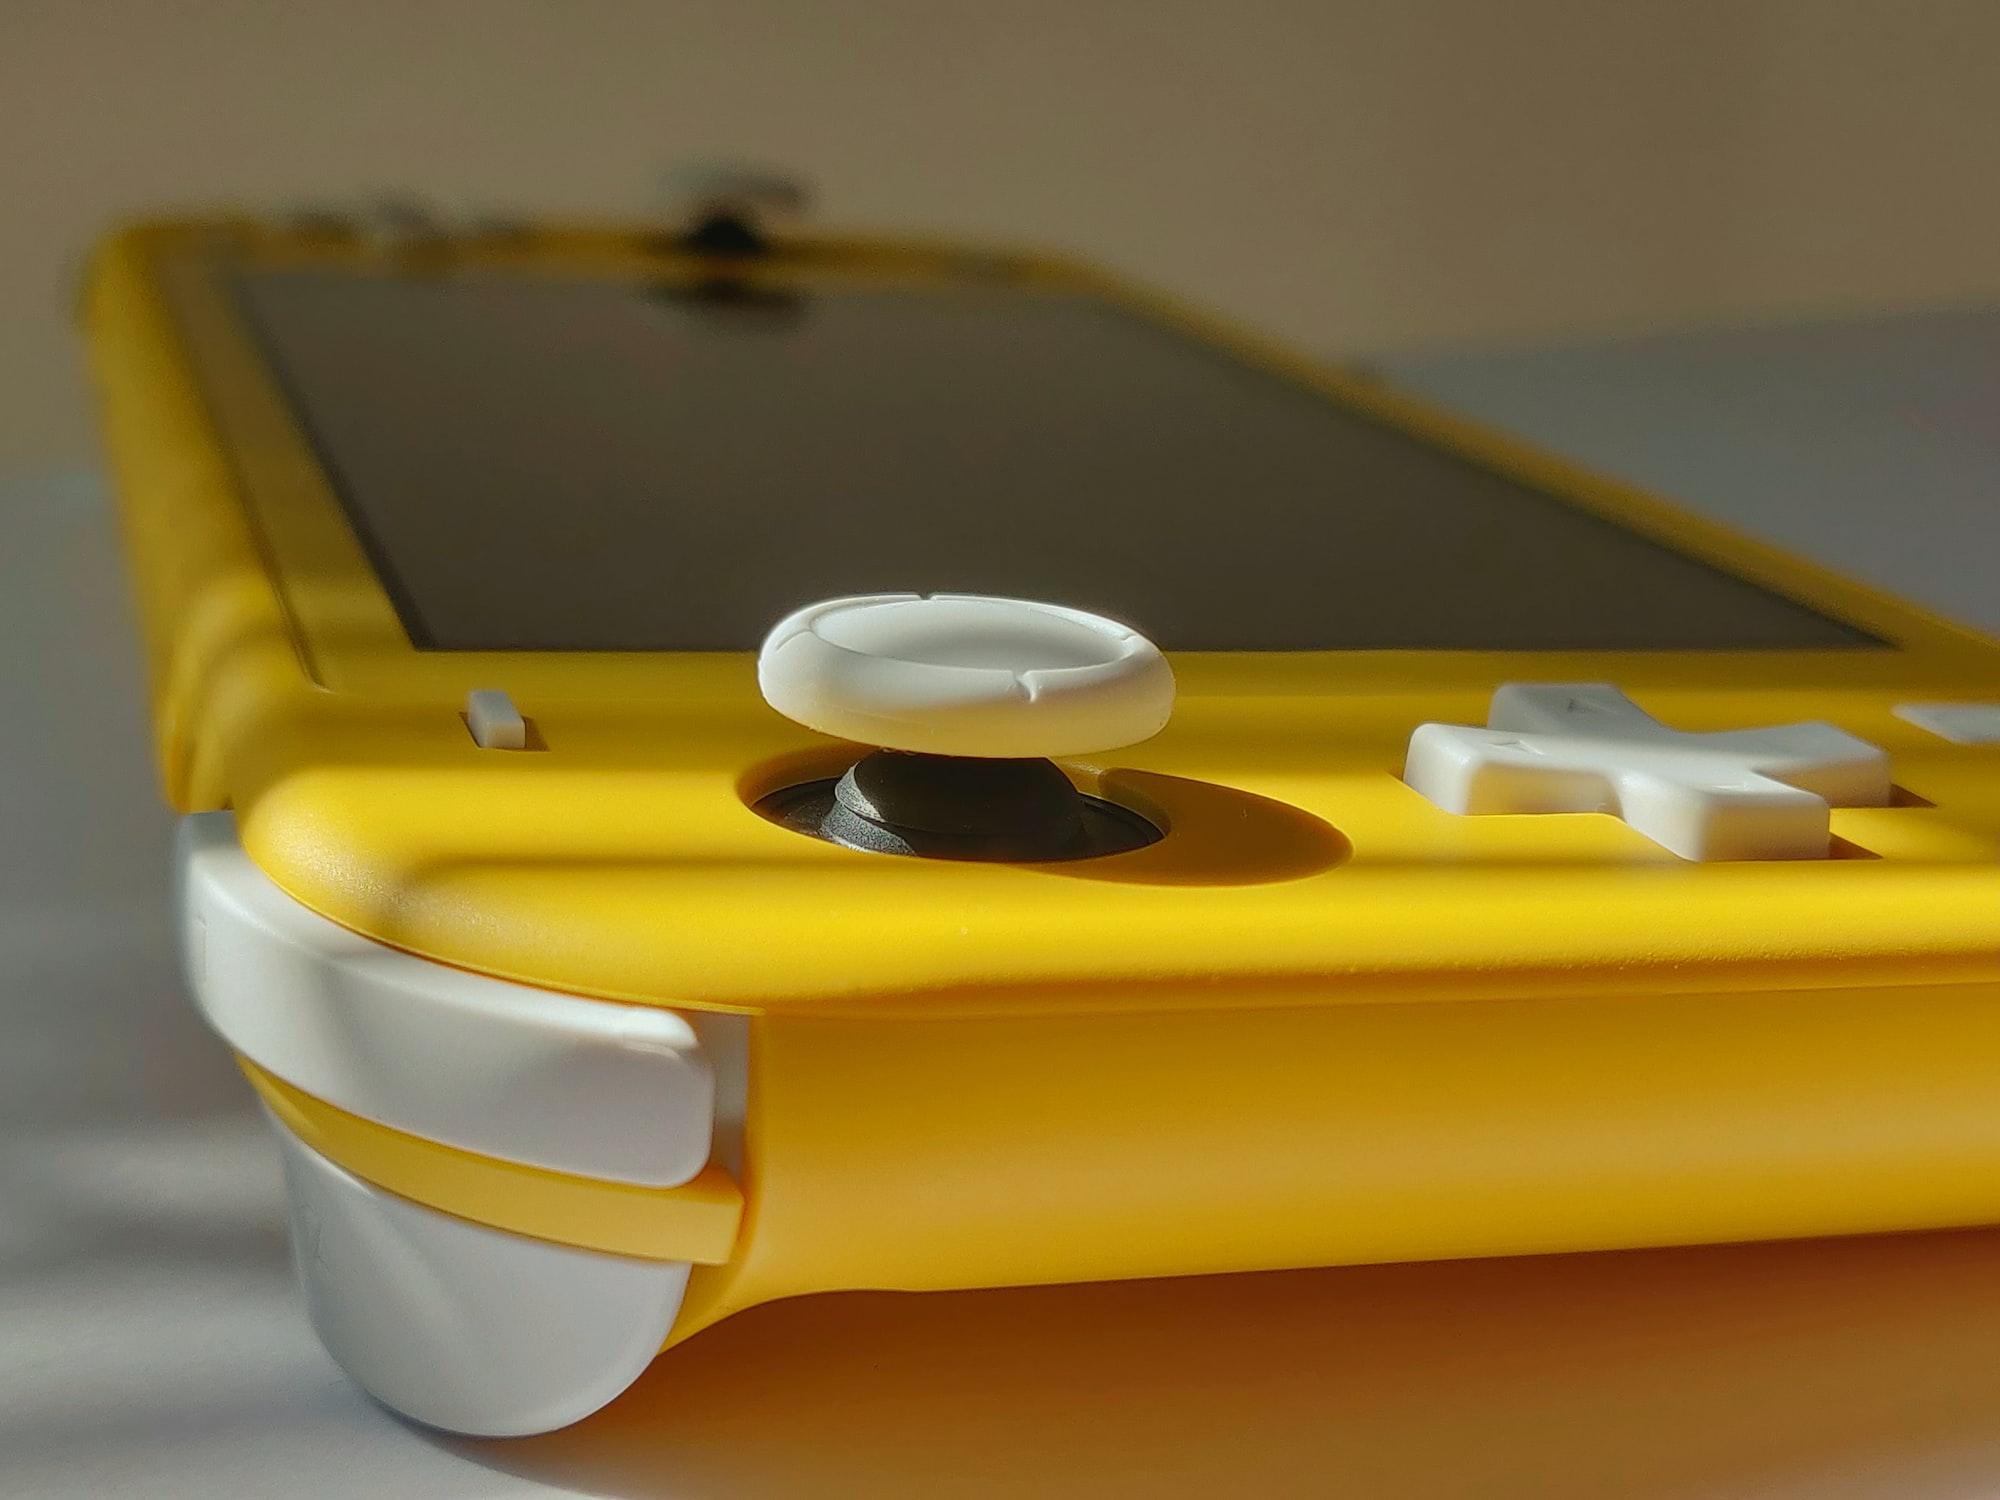 The Nintendo Switch Lite JoyCon drift problem is real